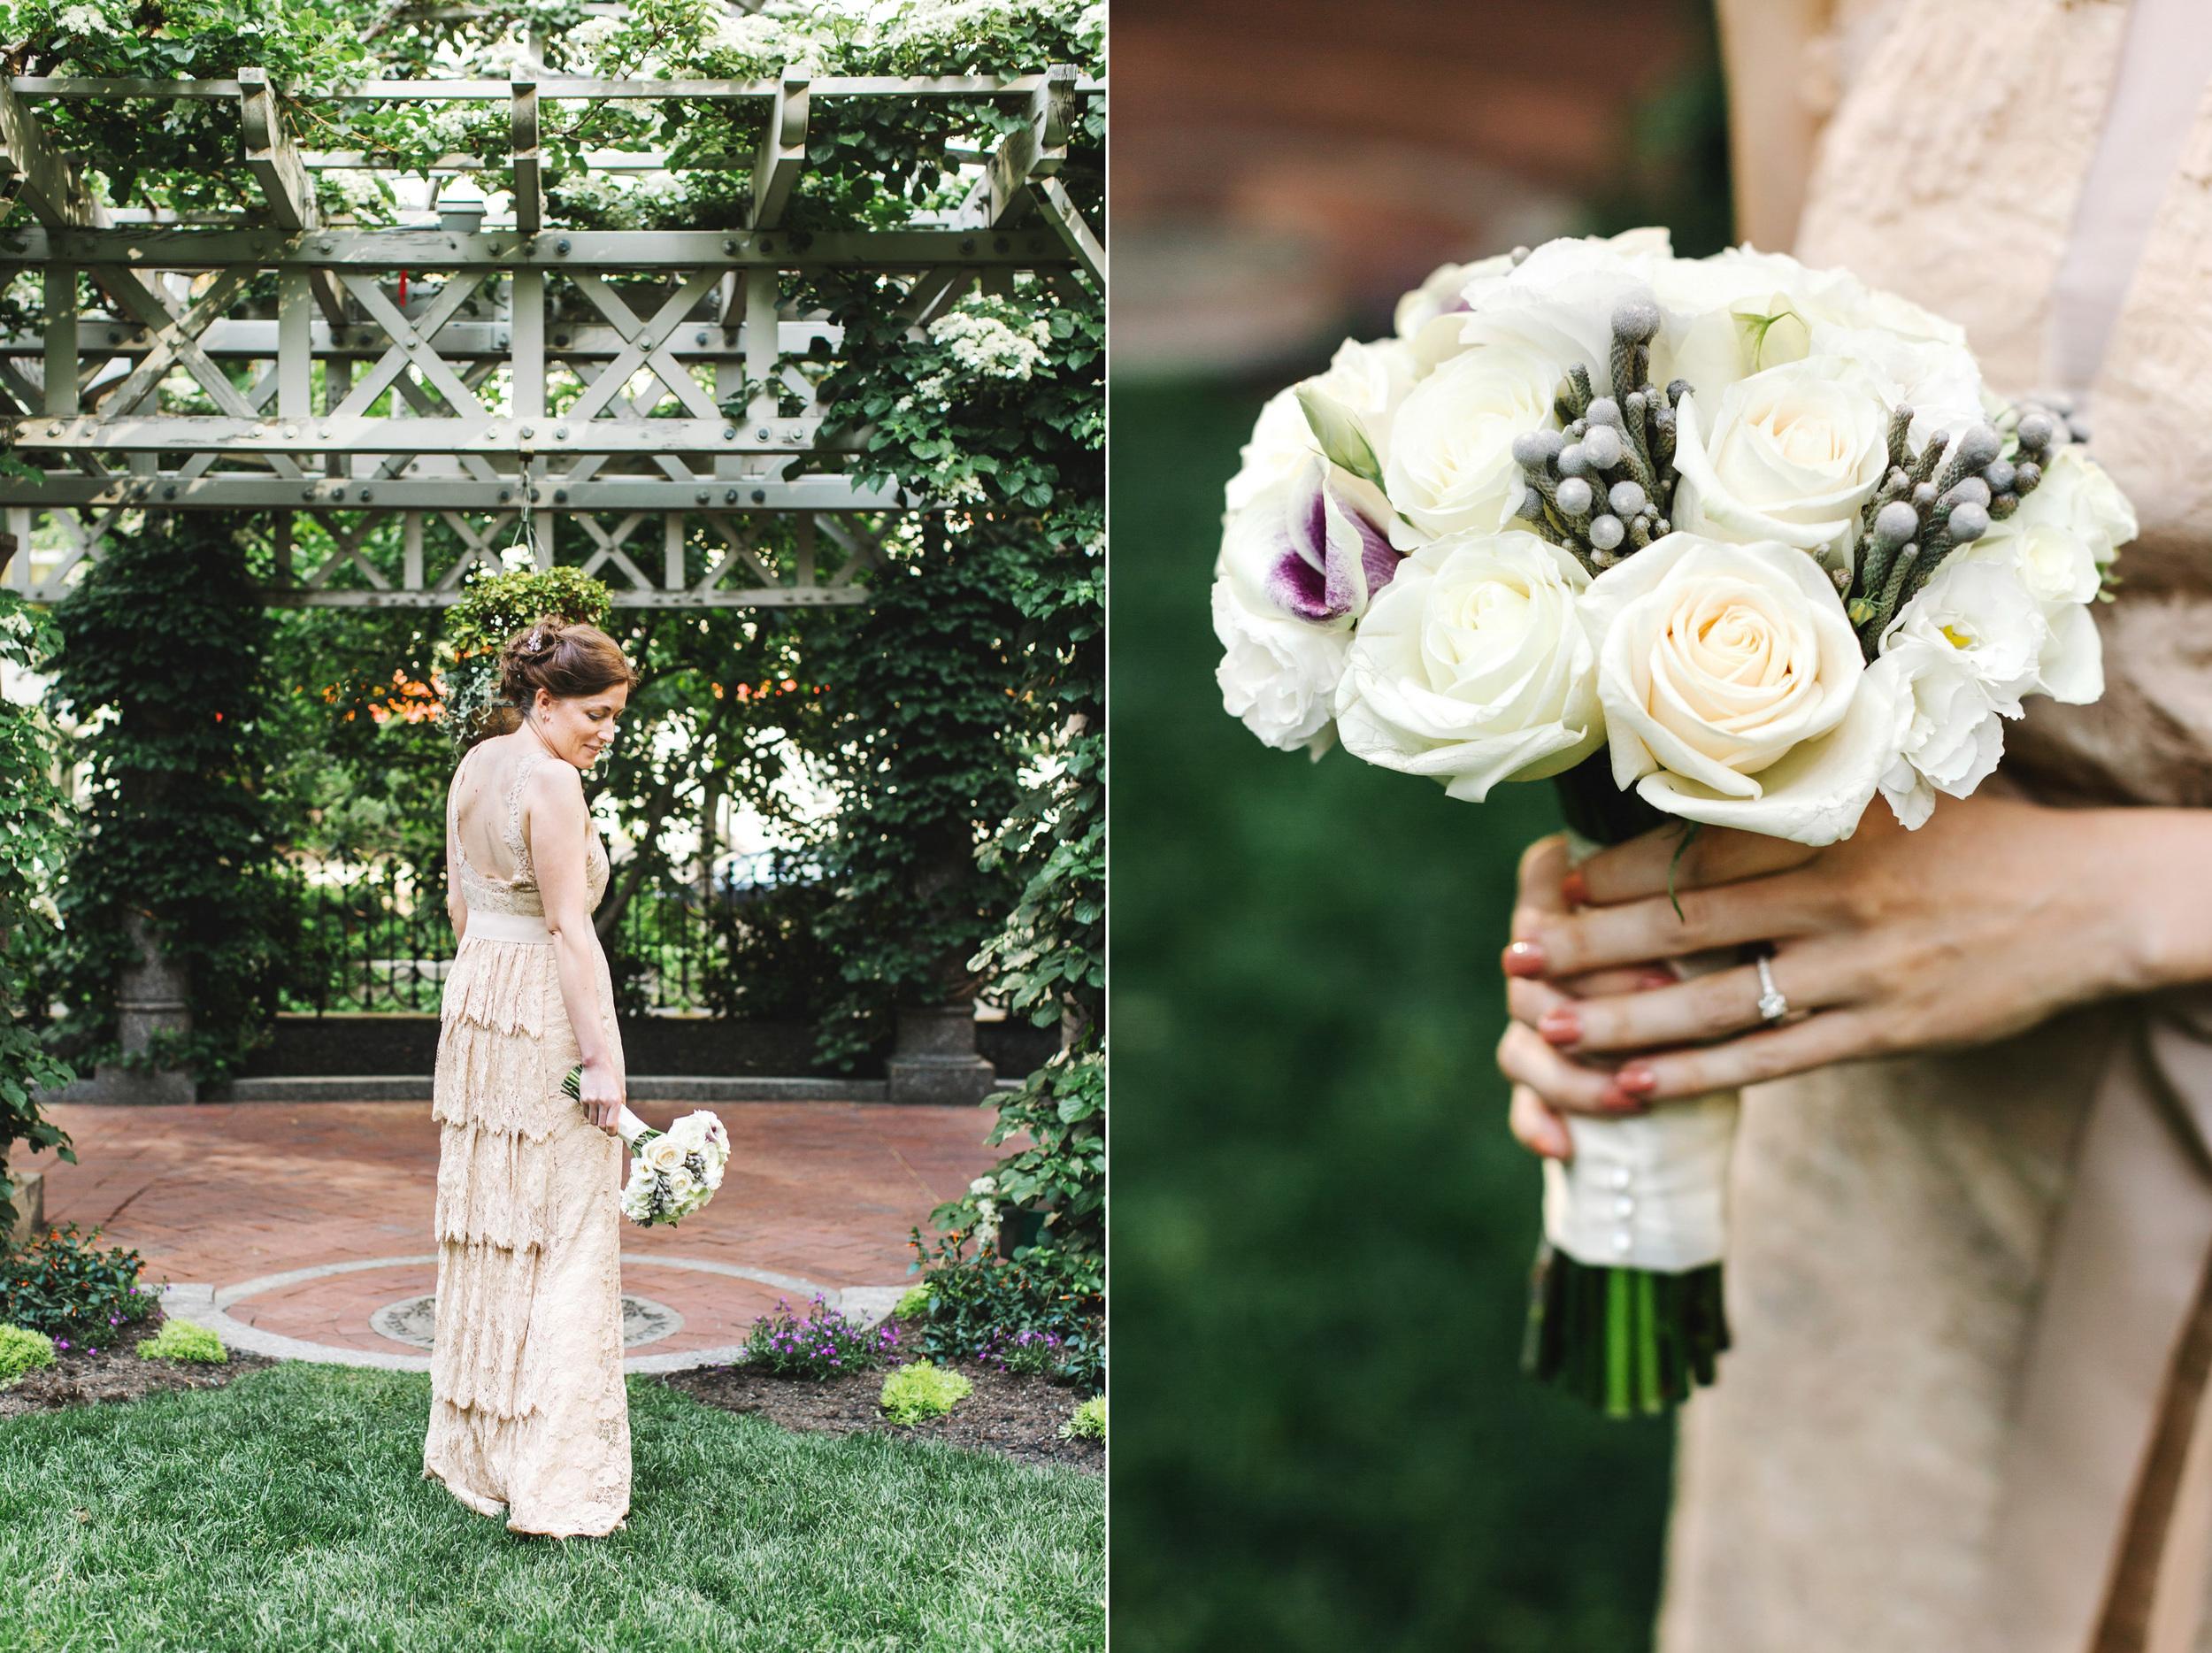 Boston_Wedding_Photographer_Lena_Mirisola-23.jpg